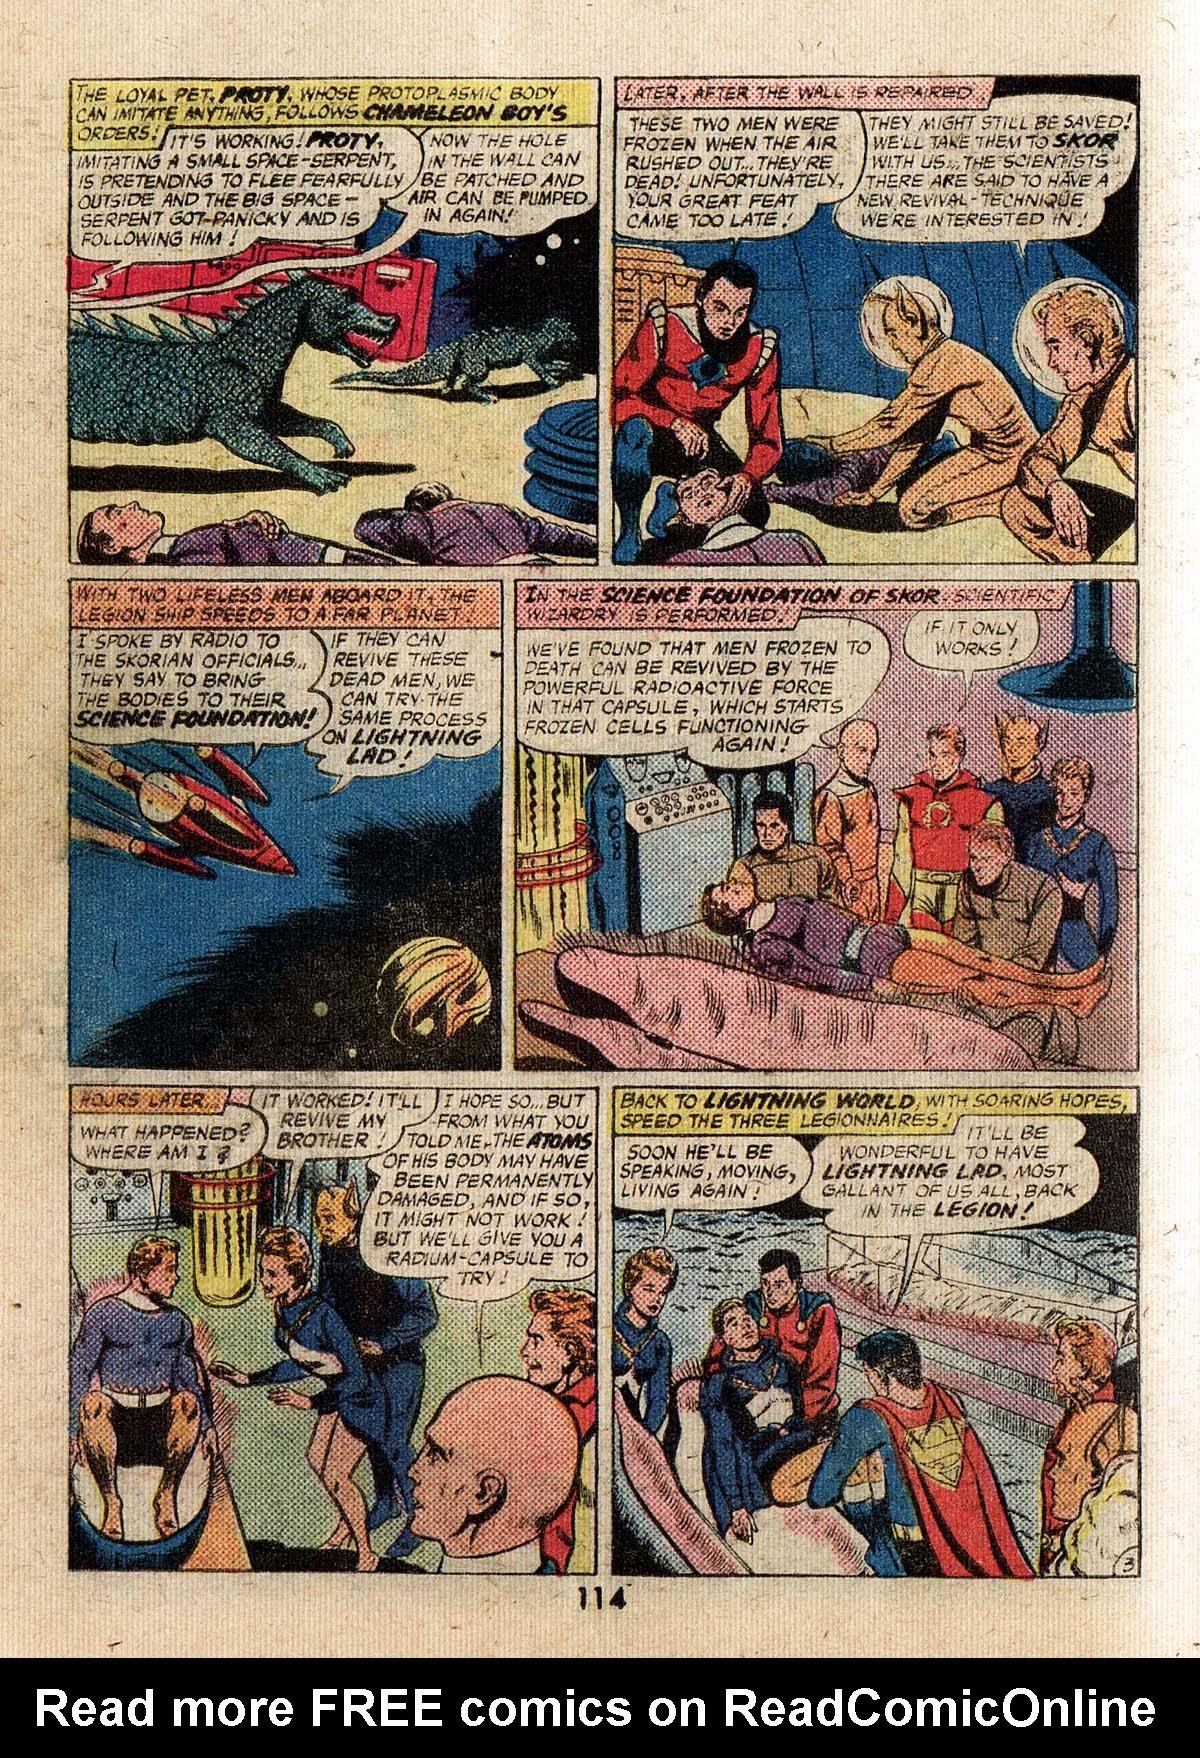 Read online Adventure Comics (1938) comic -  Issue #500 - 114